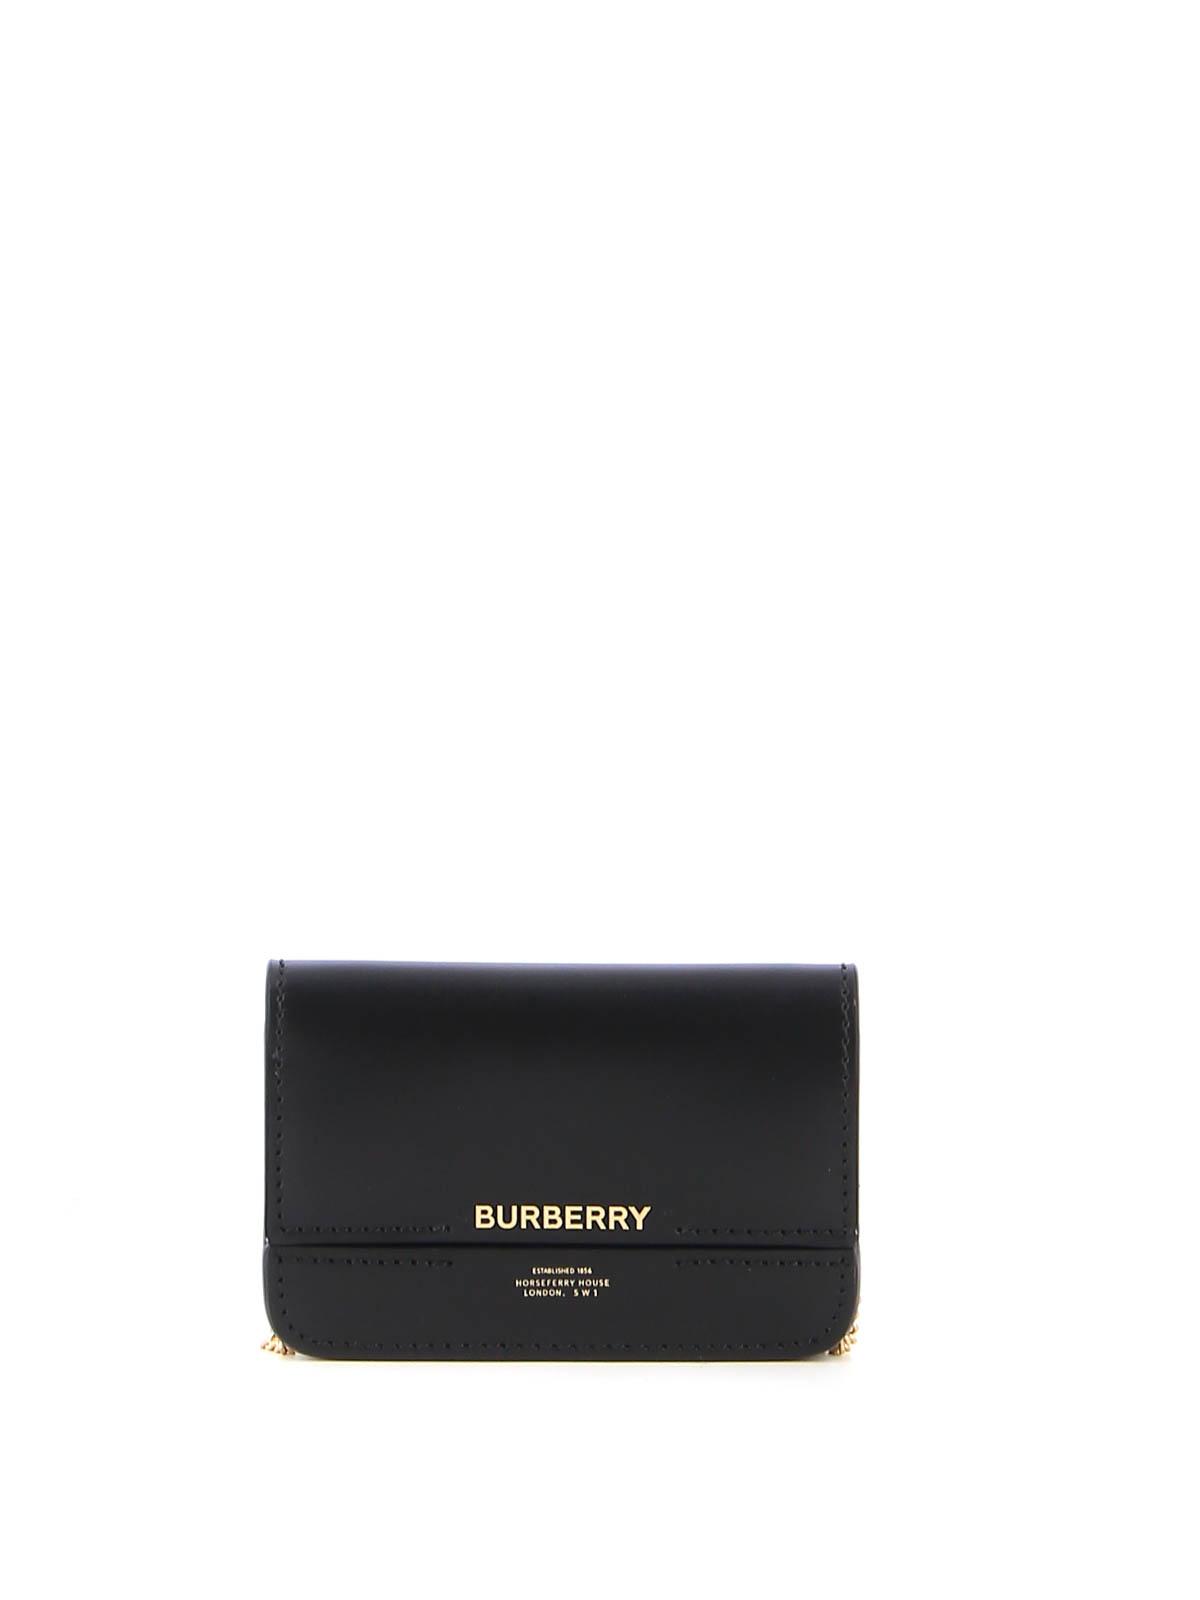 Burberry Cardholders Jody card holder